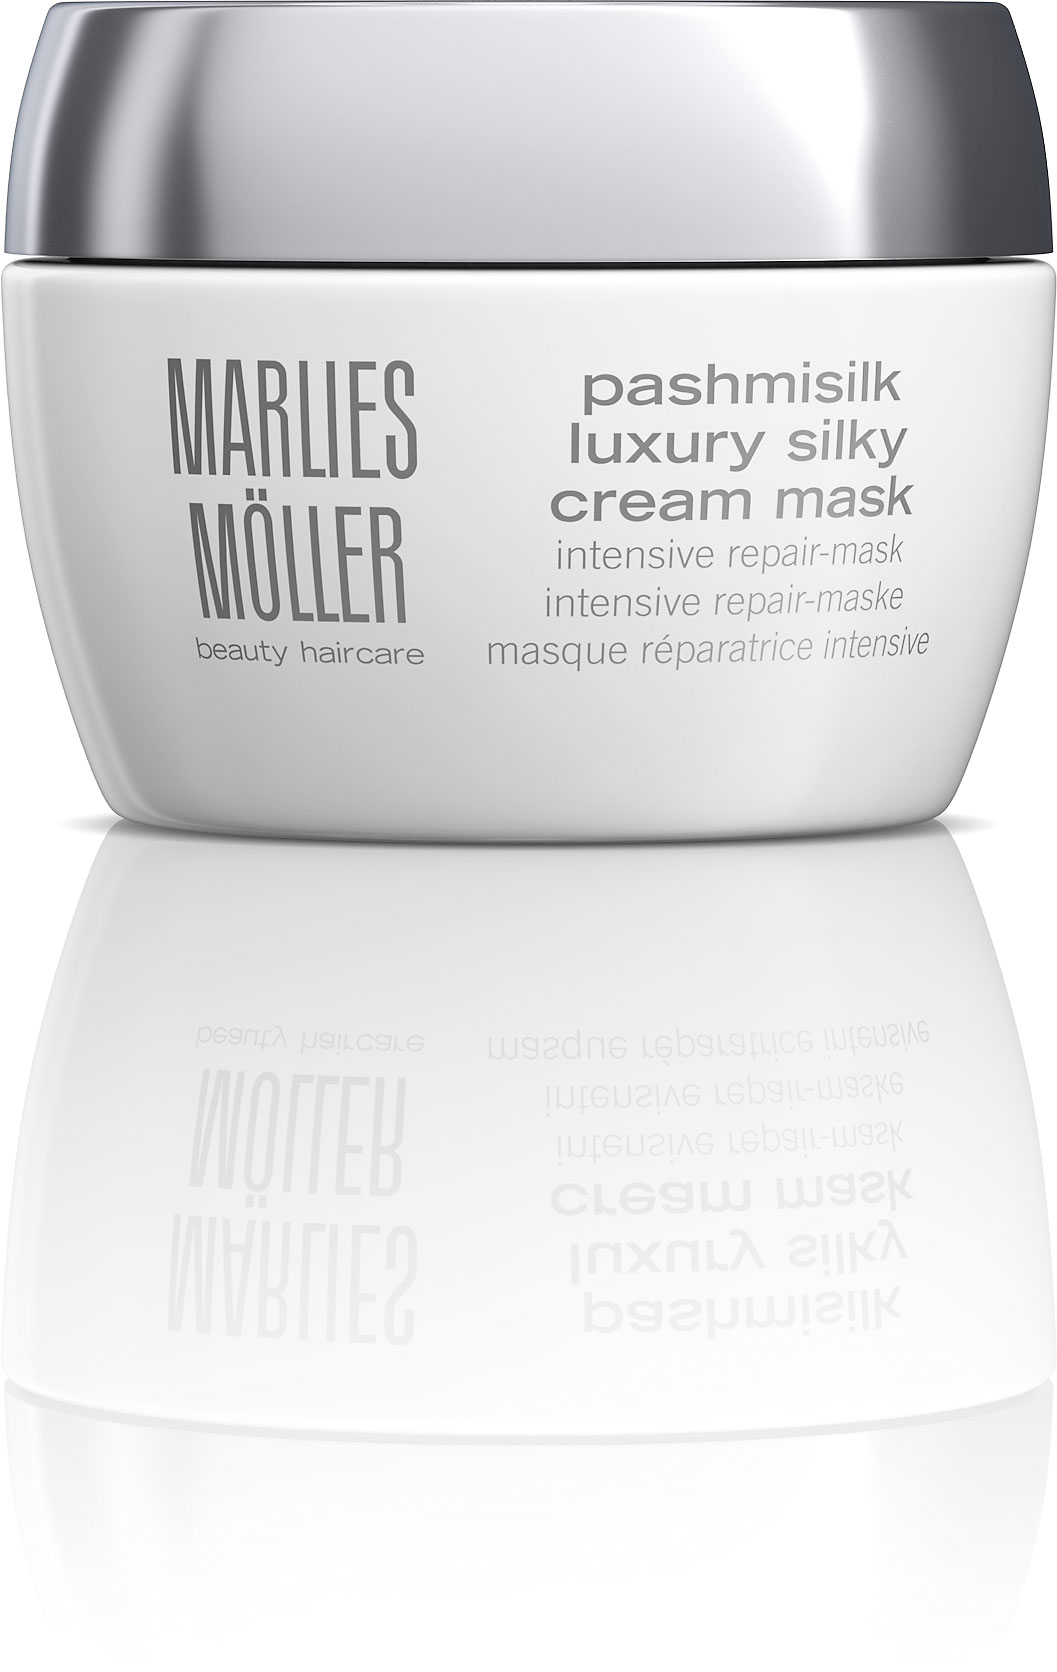 Marlies Möller Pash Silk Int Cream Mask 125 ml